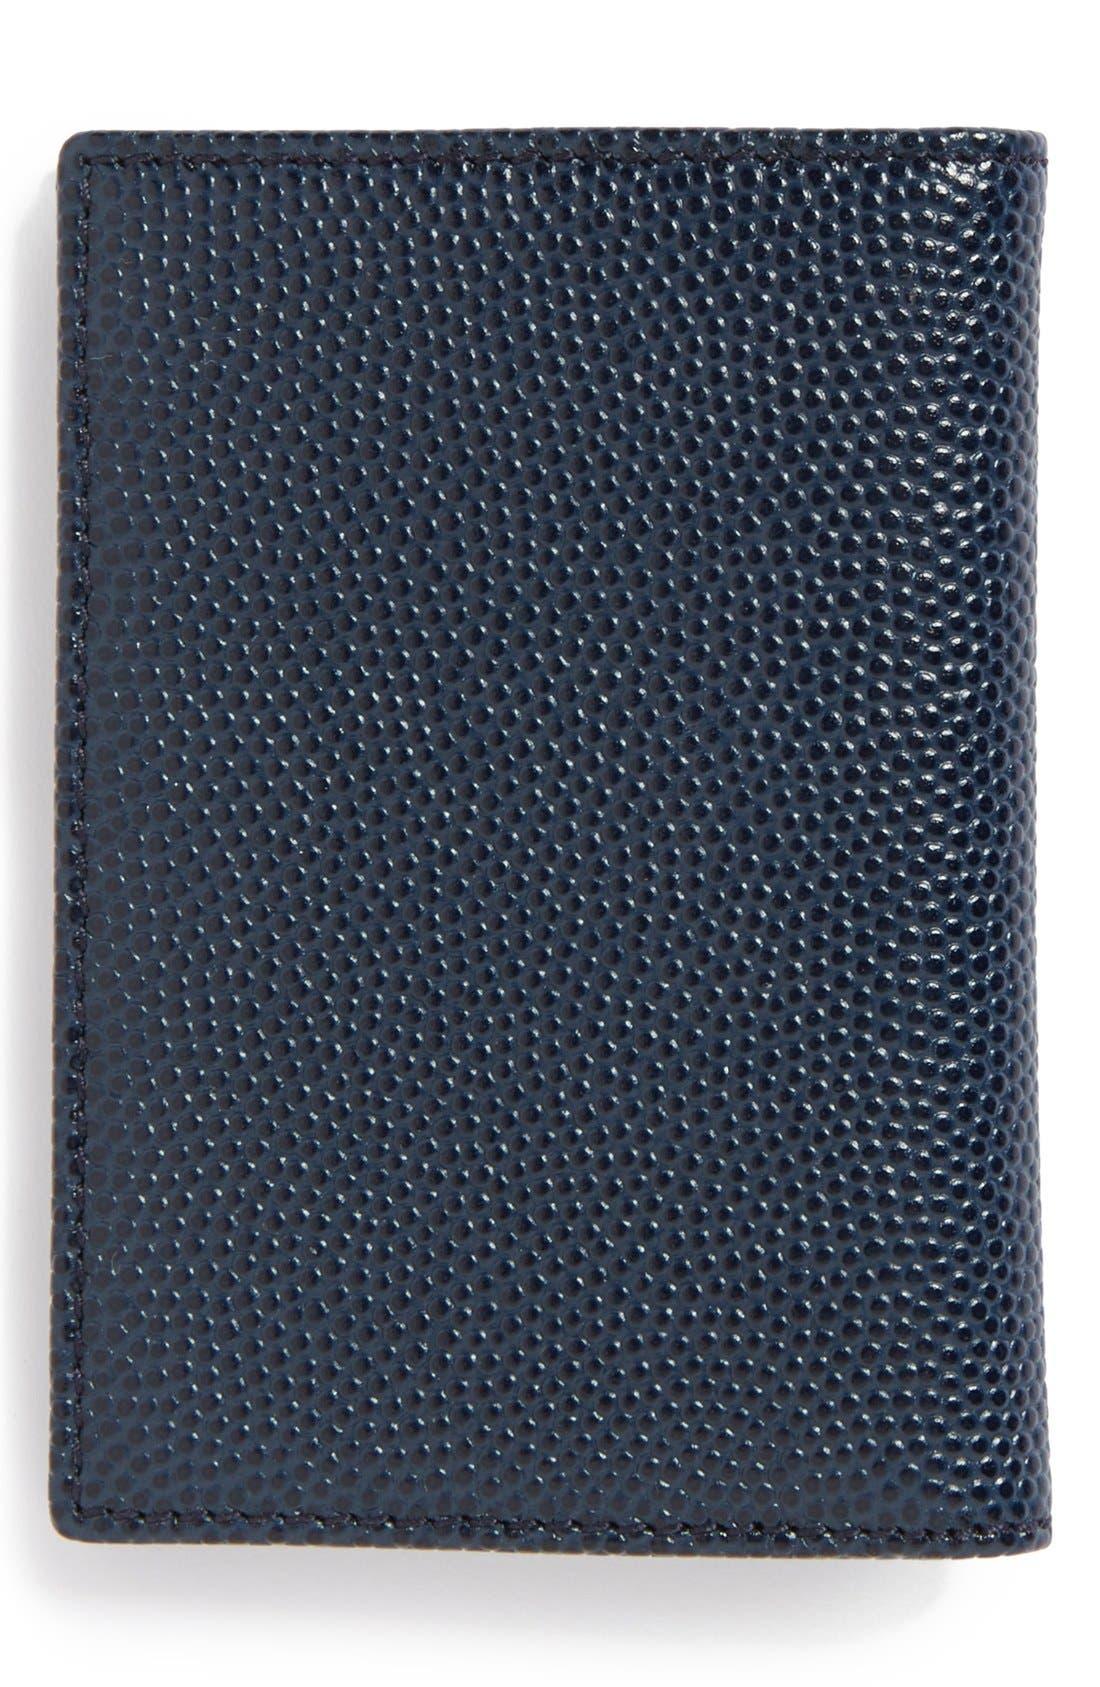 Alternate Image 3  - Salvatore Ferragamo 'Ten Forty One' Leather Card Case